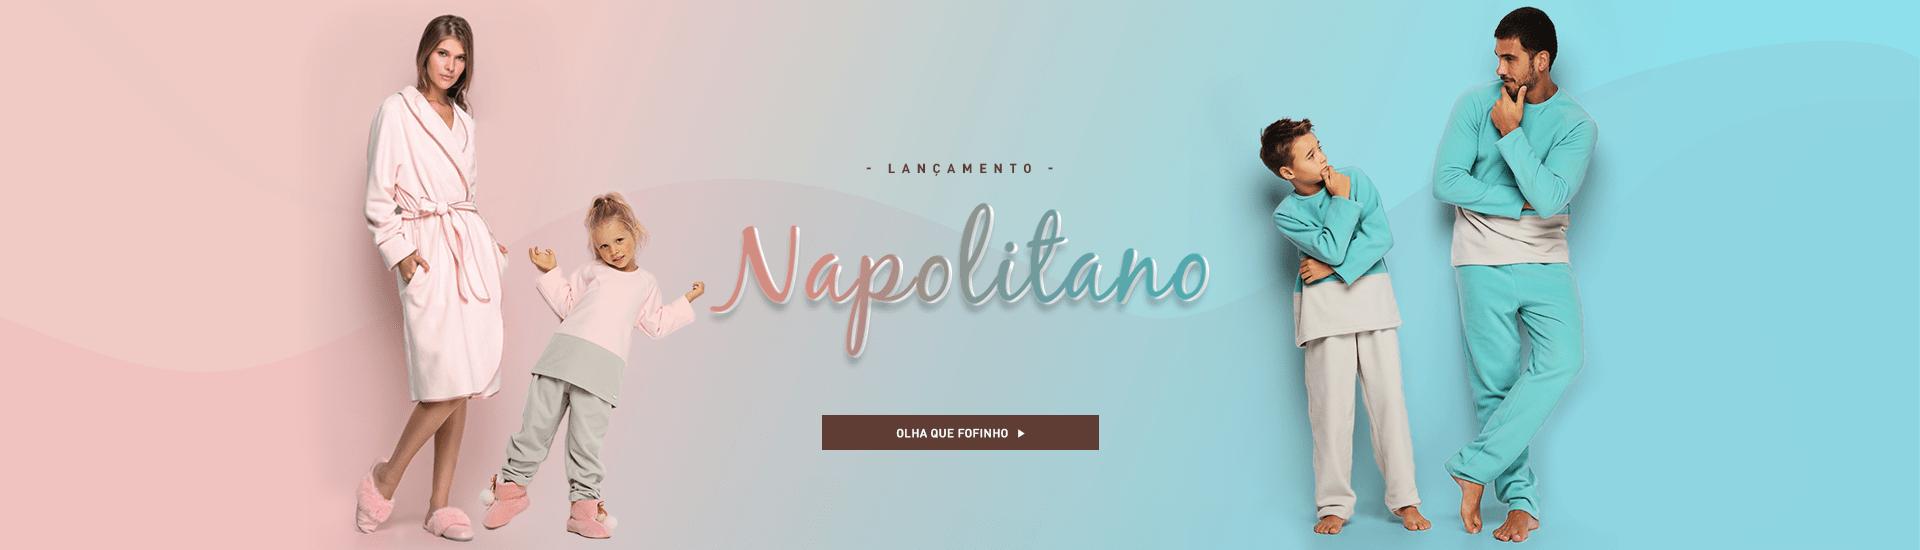 semana13-banner-TOP-napolitano